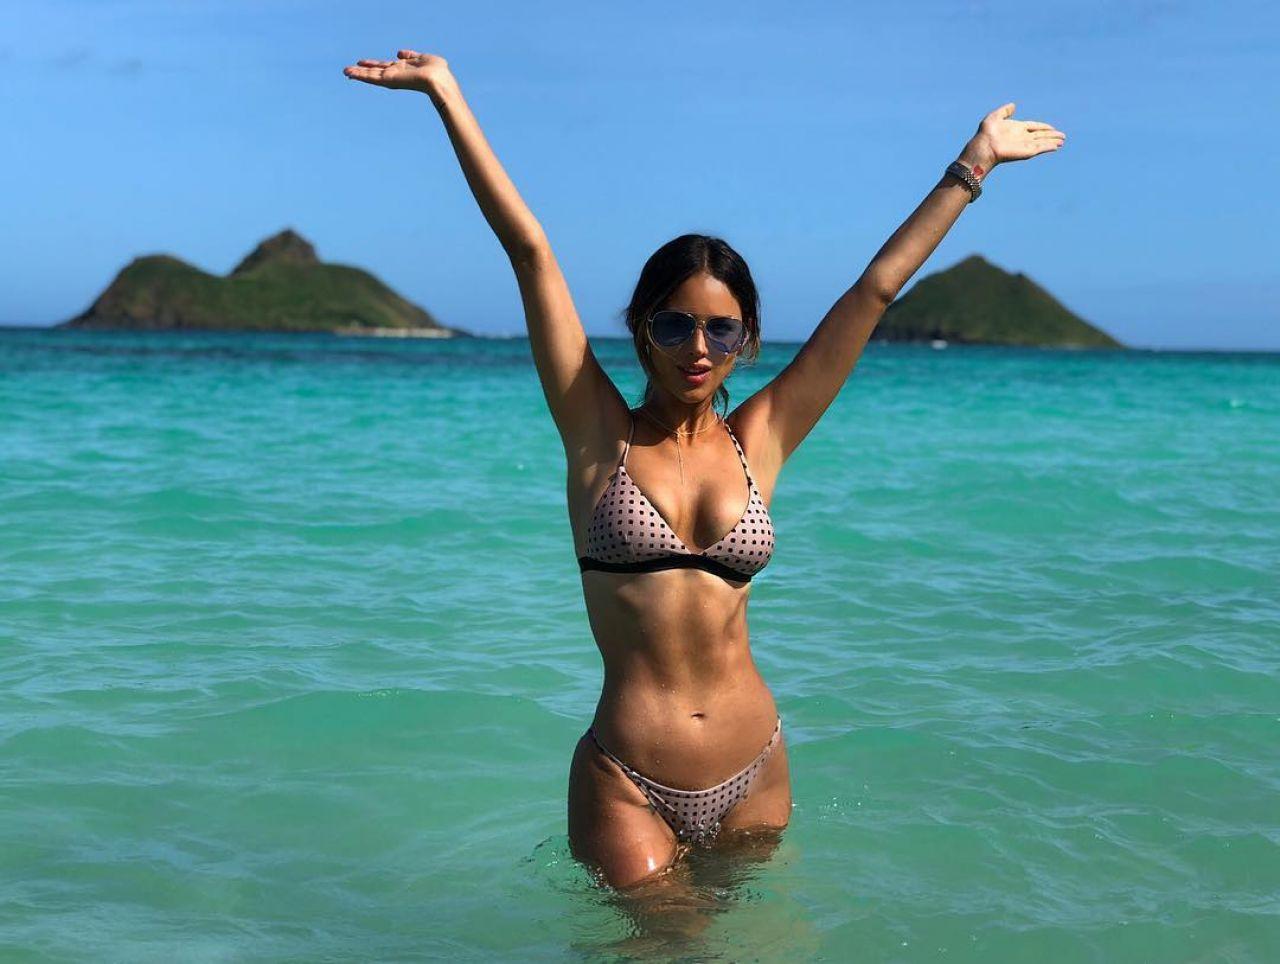 Bikini Dakota Gonzalez naked (41 photos), Topless, Cleavage, Boobs, butt 2018